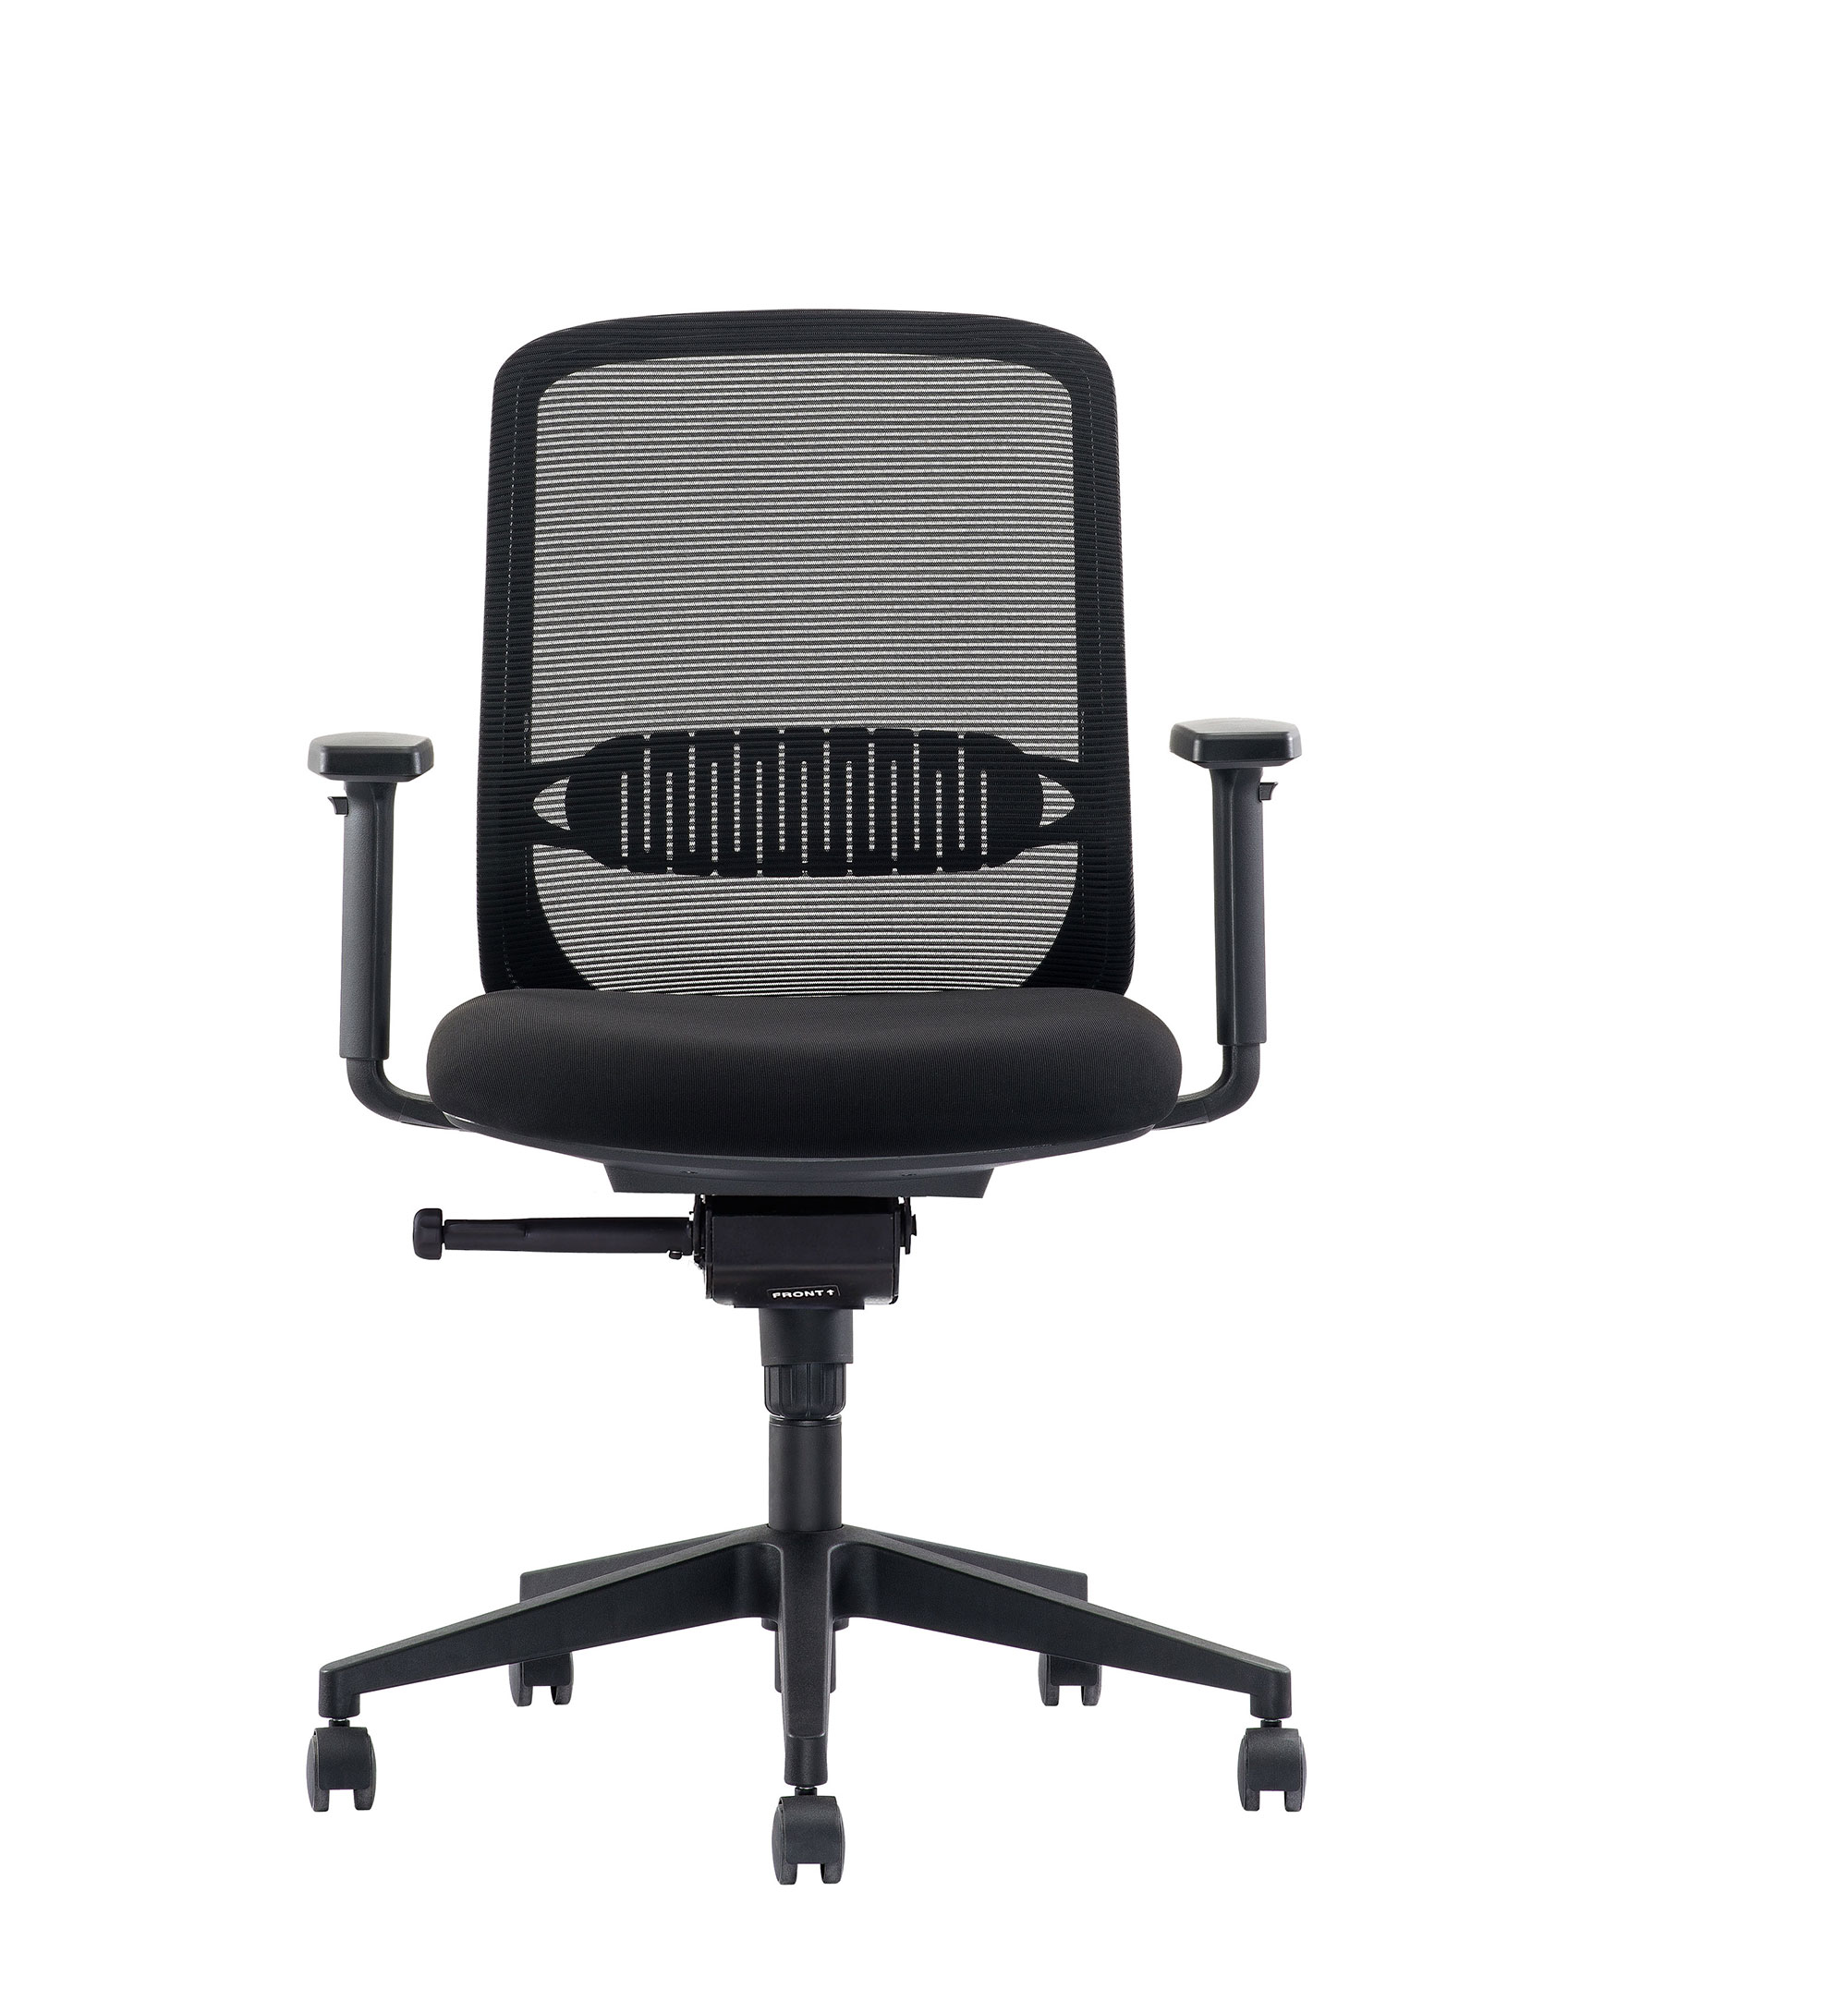 ORCO-MESH-LU2 Bürostuhl